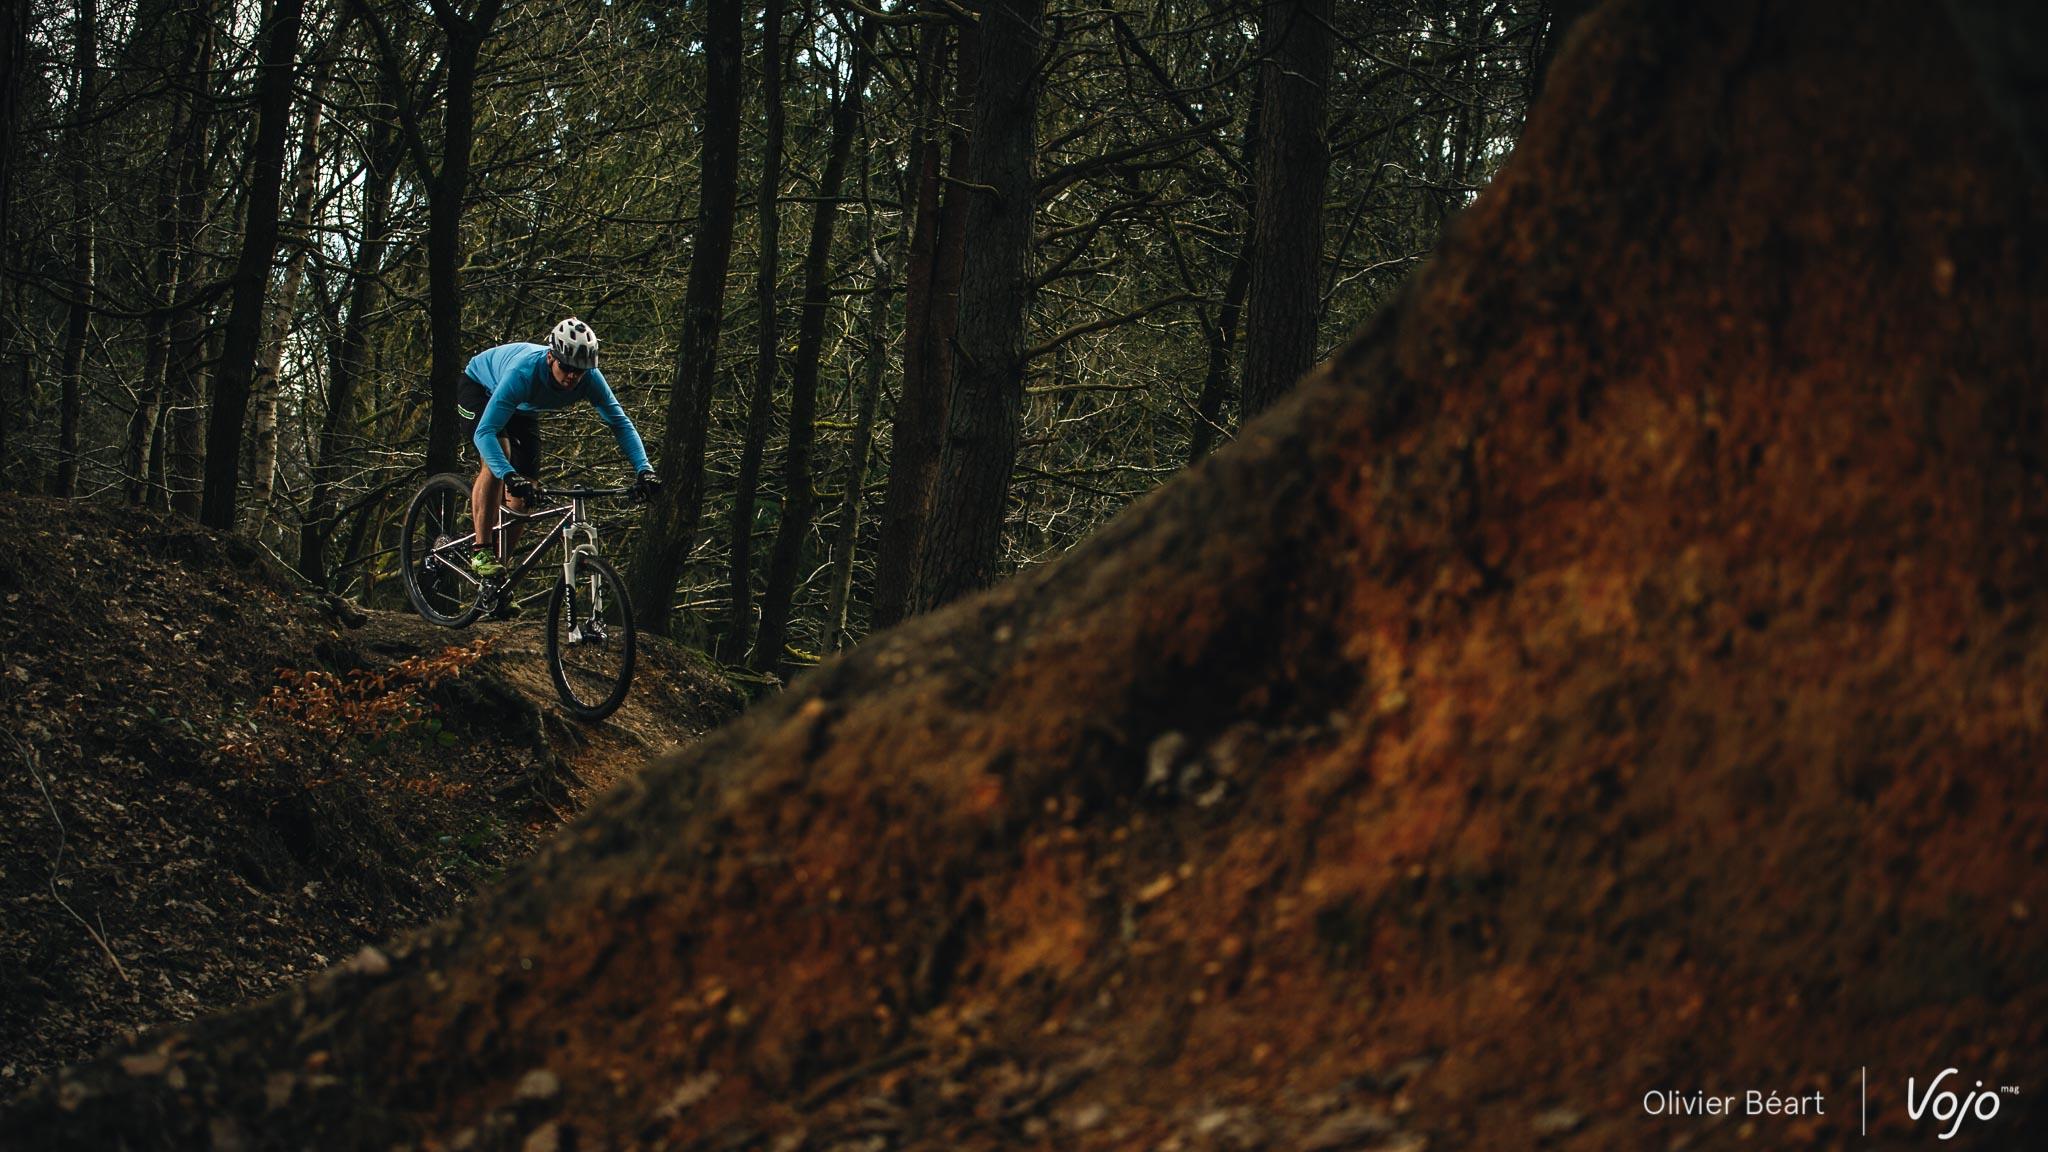 cycles_leon_decouverte_copyright_obeart_vojomag-78